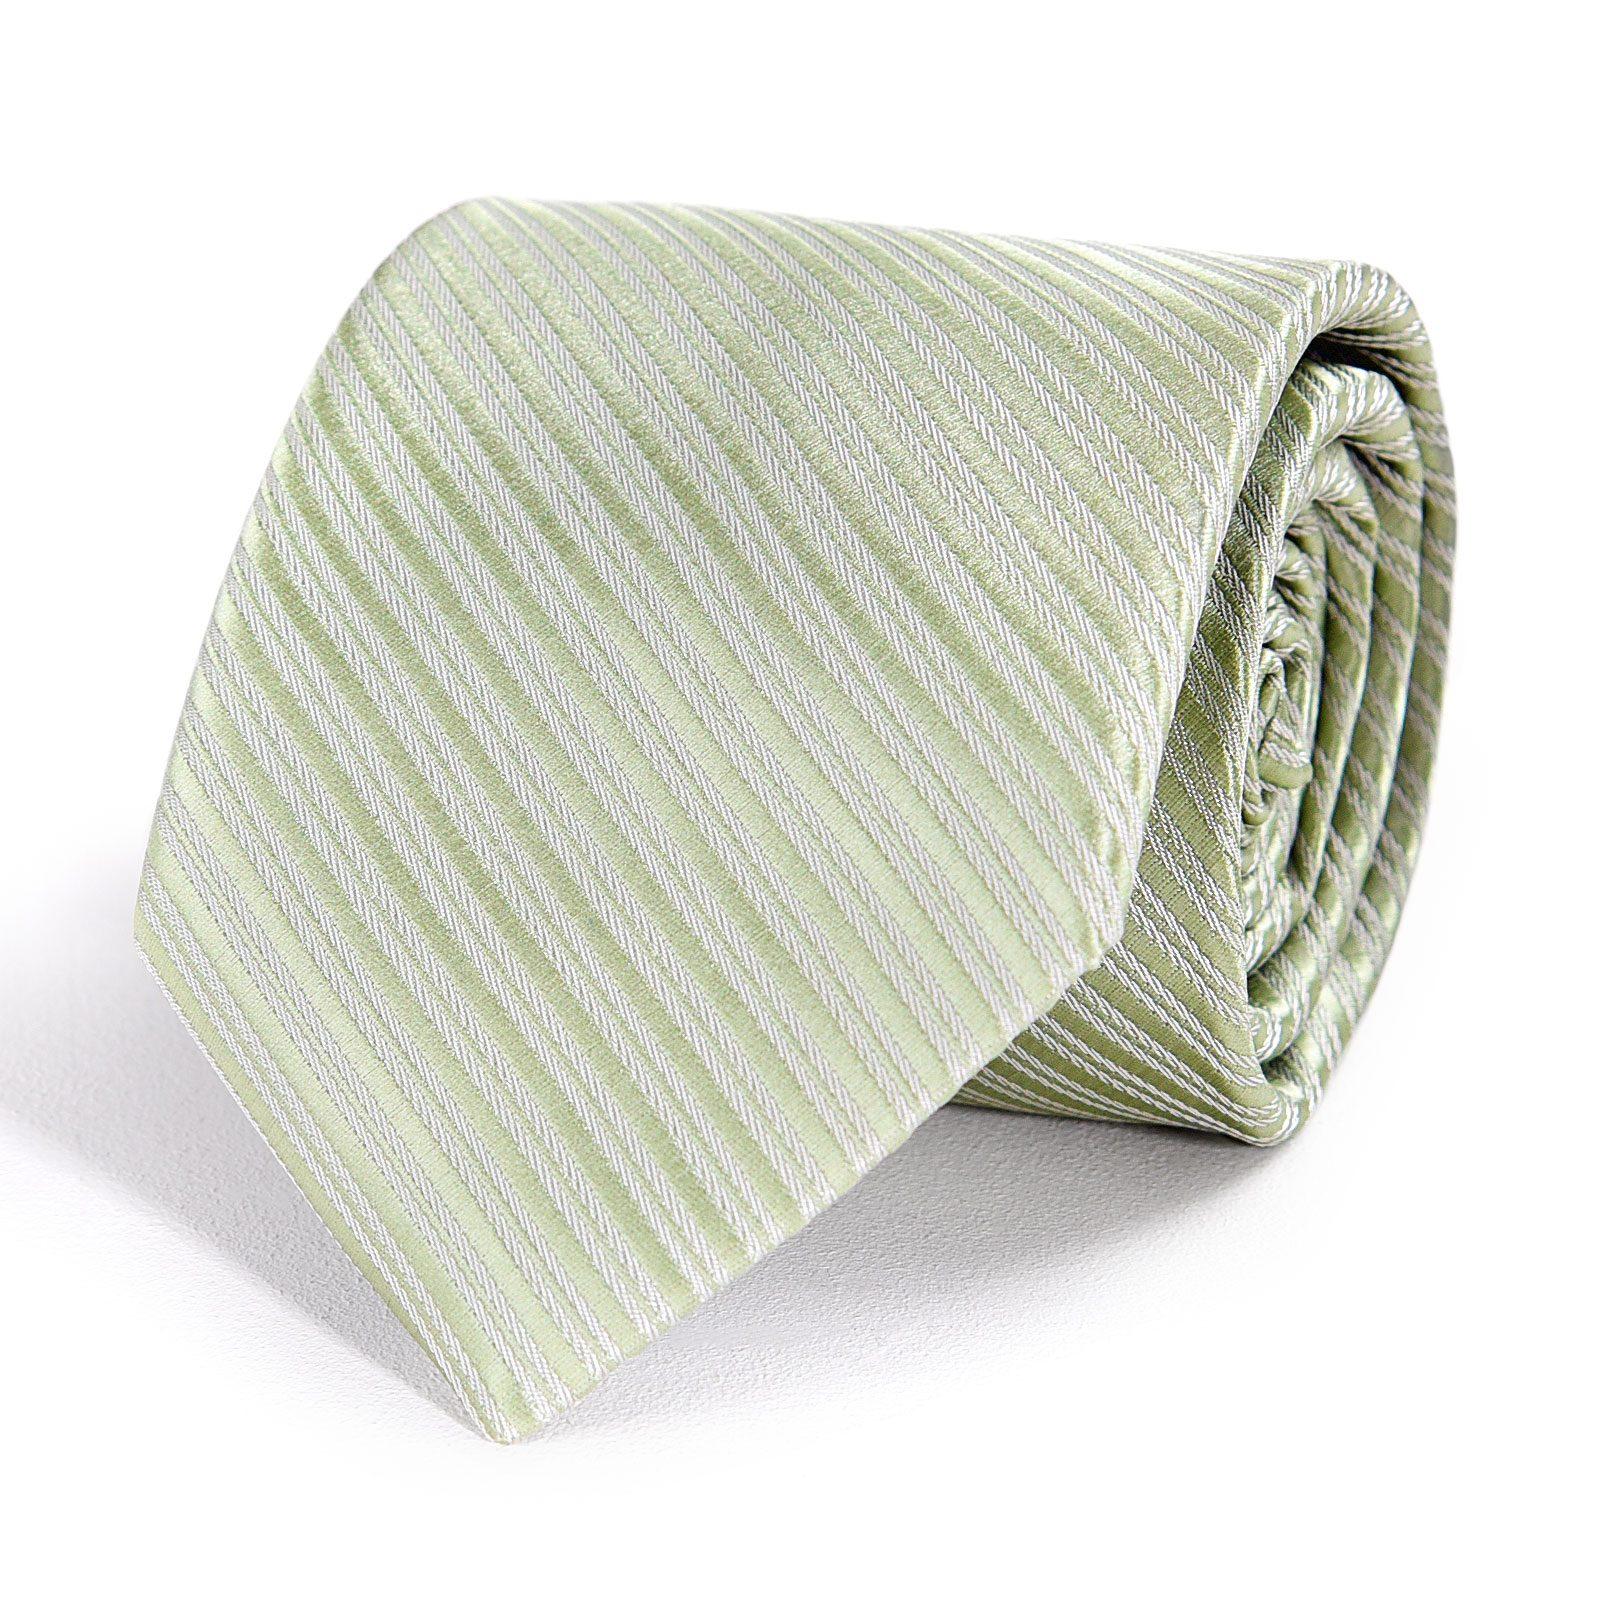 http://lookbook.allee-du-foulard.fr/wp-content/uploads/2018/11/CV-00356-F16-cravate-homme-faux-uni-vert-tilleul-1600x1600.jpg